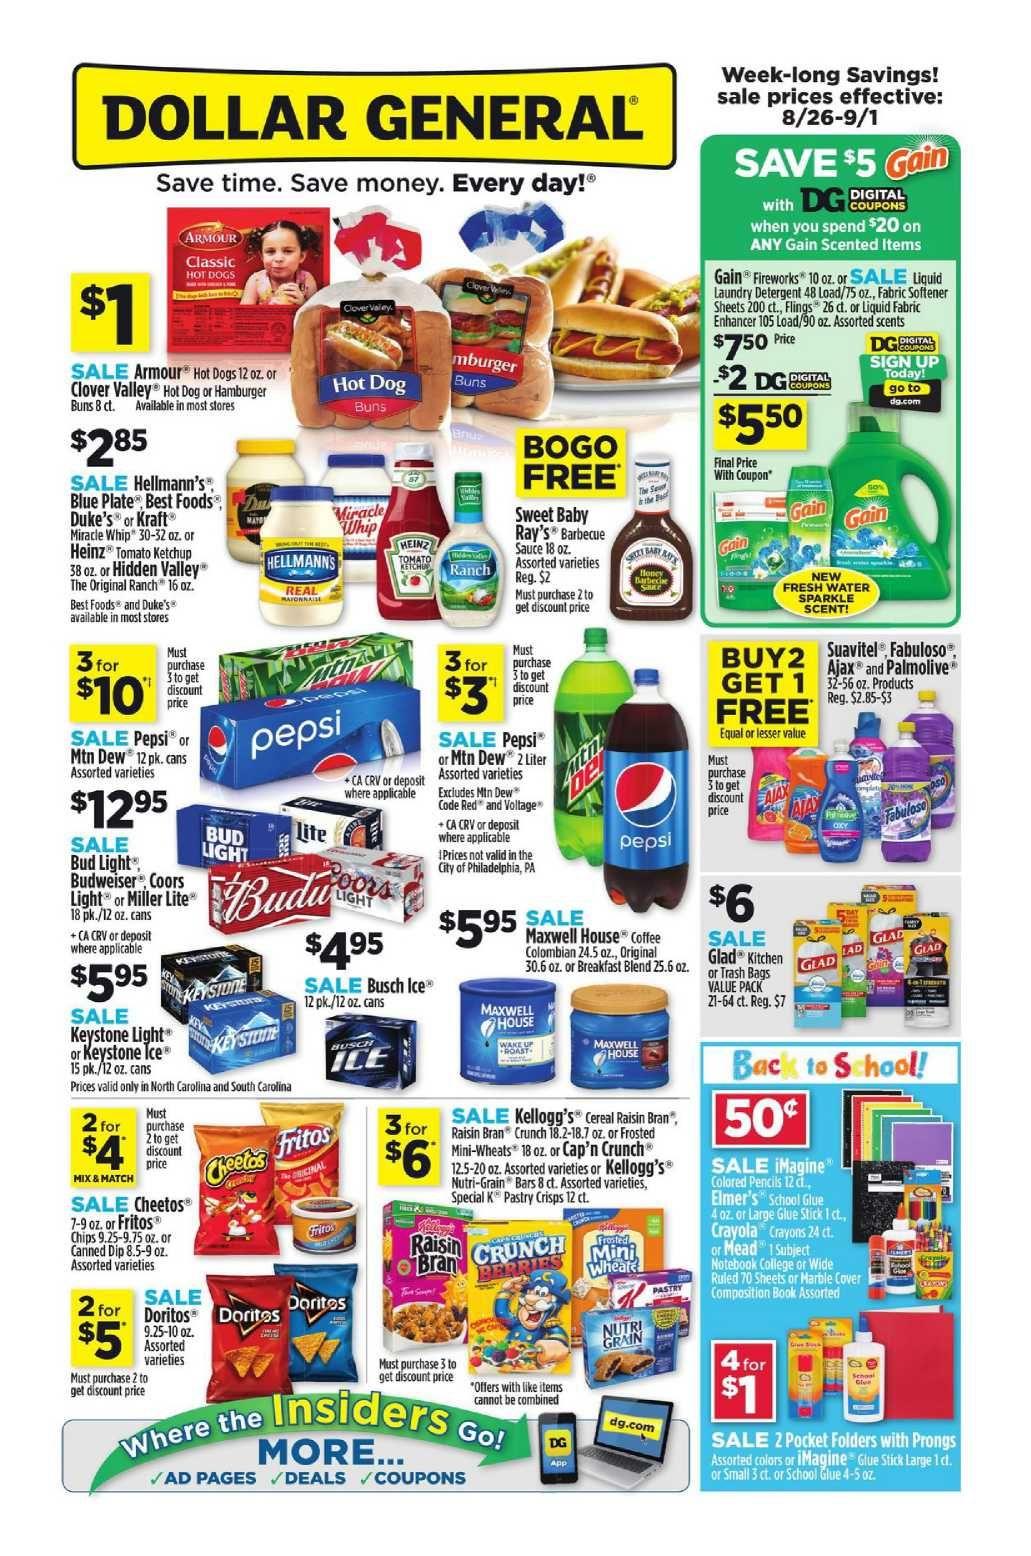 Dollar General Weekly Ad Flyer January 20 26 2019 Weeklyad123 Com Weekly Ad Circular Grocery Stores Dollar General Weekly Ads Hot Dog Buns